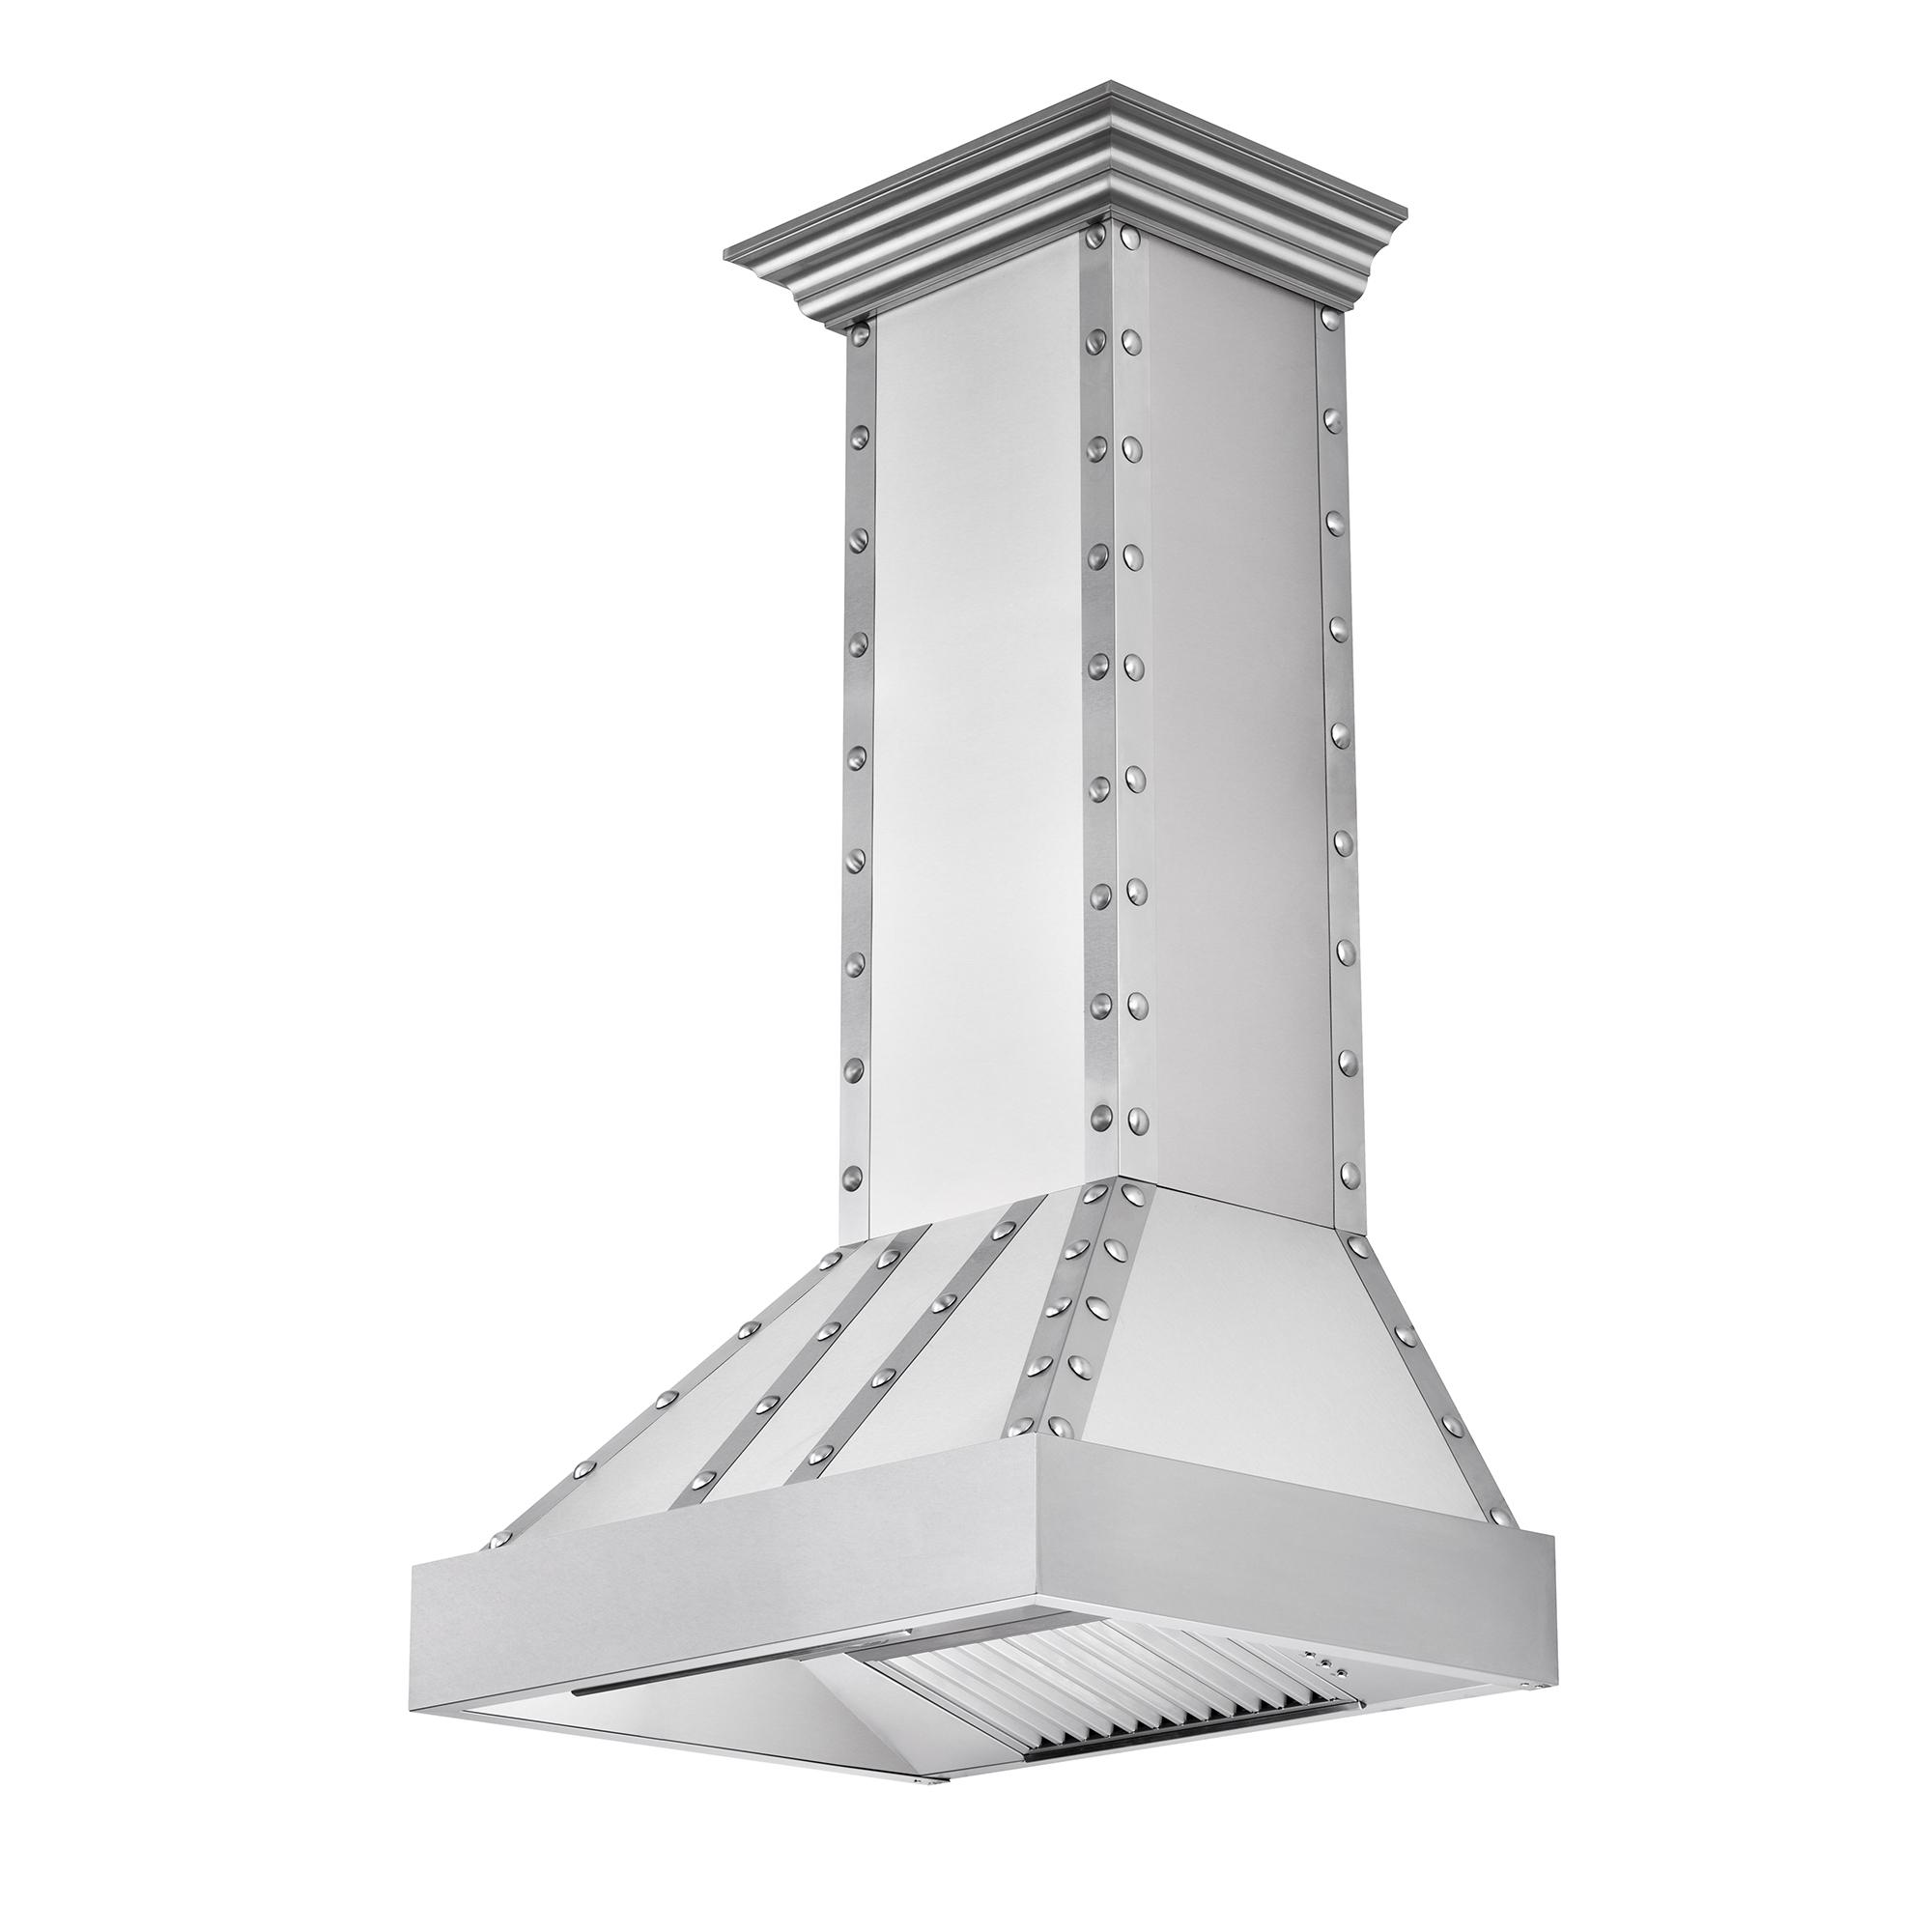 zline-stainless-steel-wall-mounted-range-hood-655-4SSSS-side-under.jpg